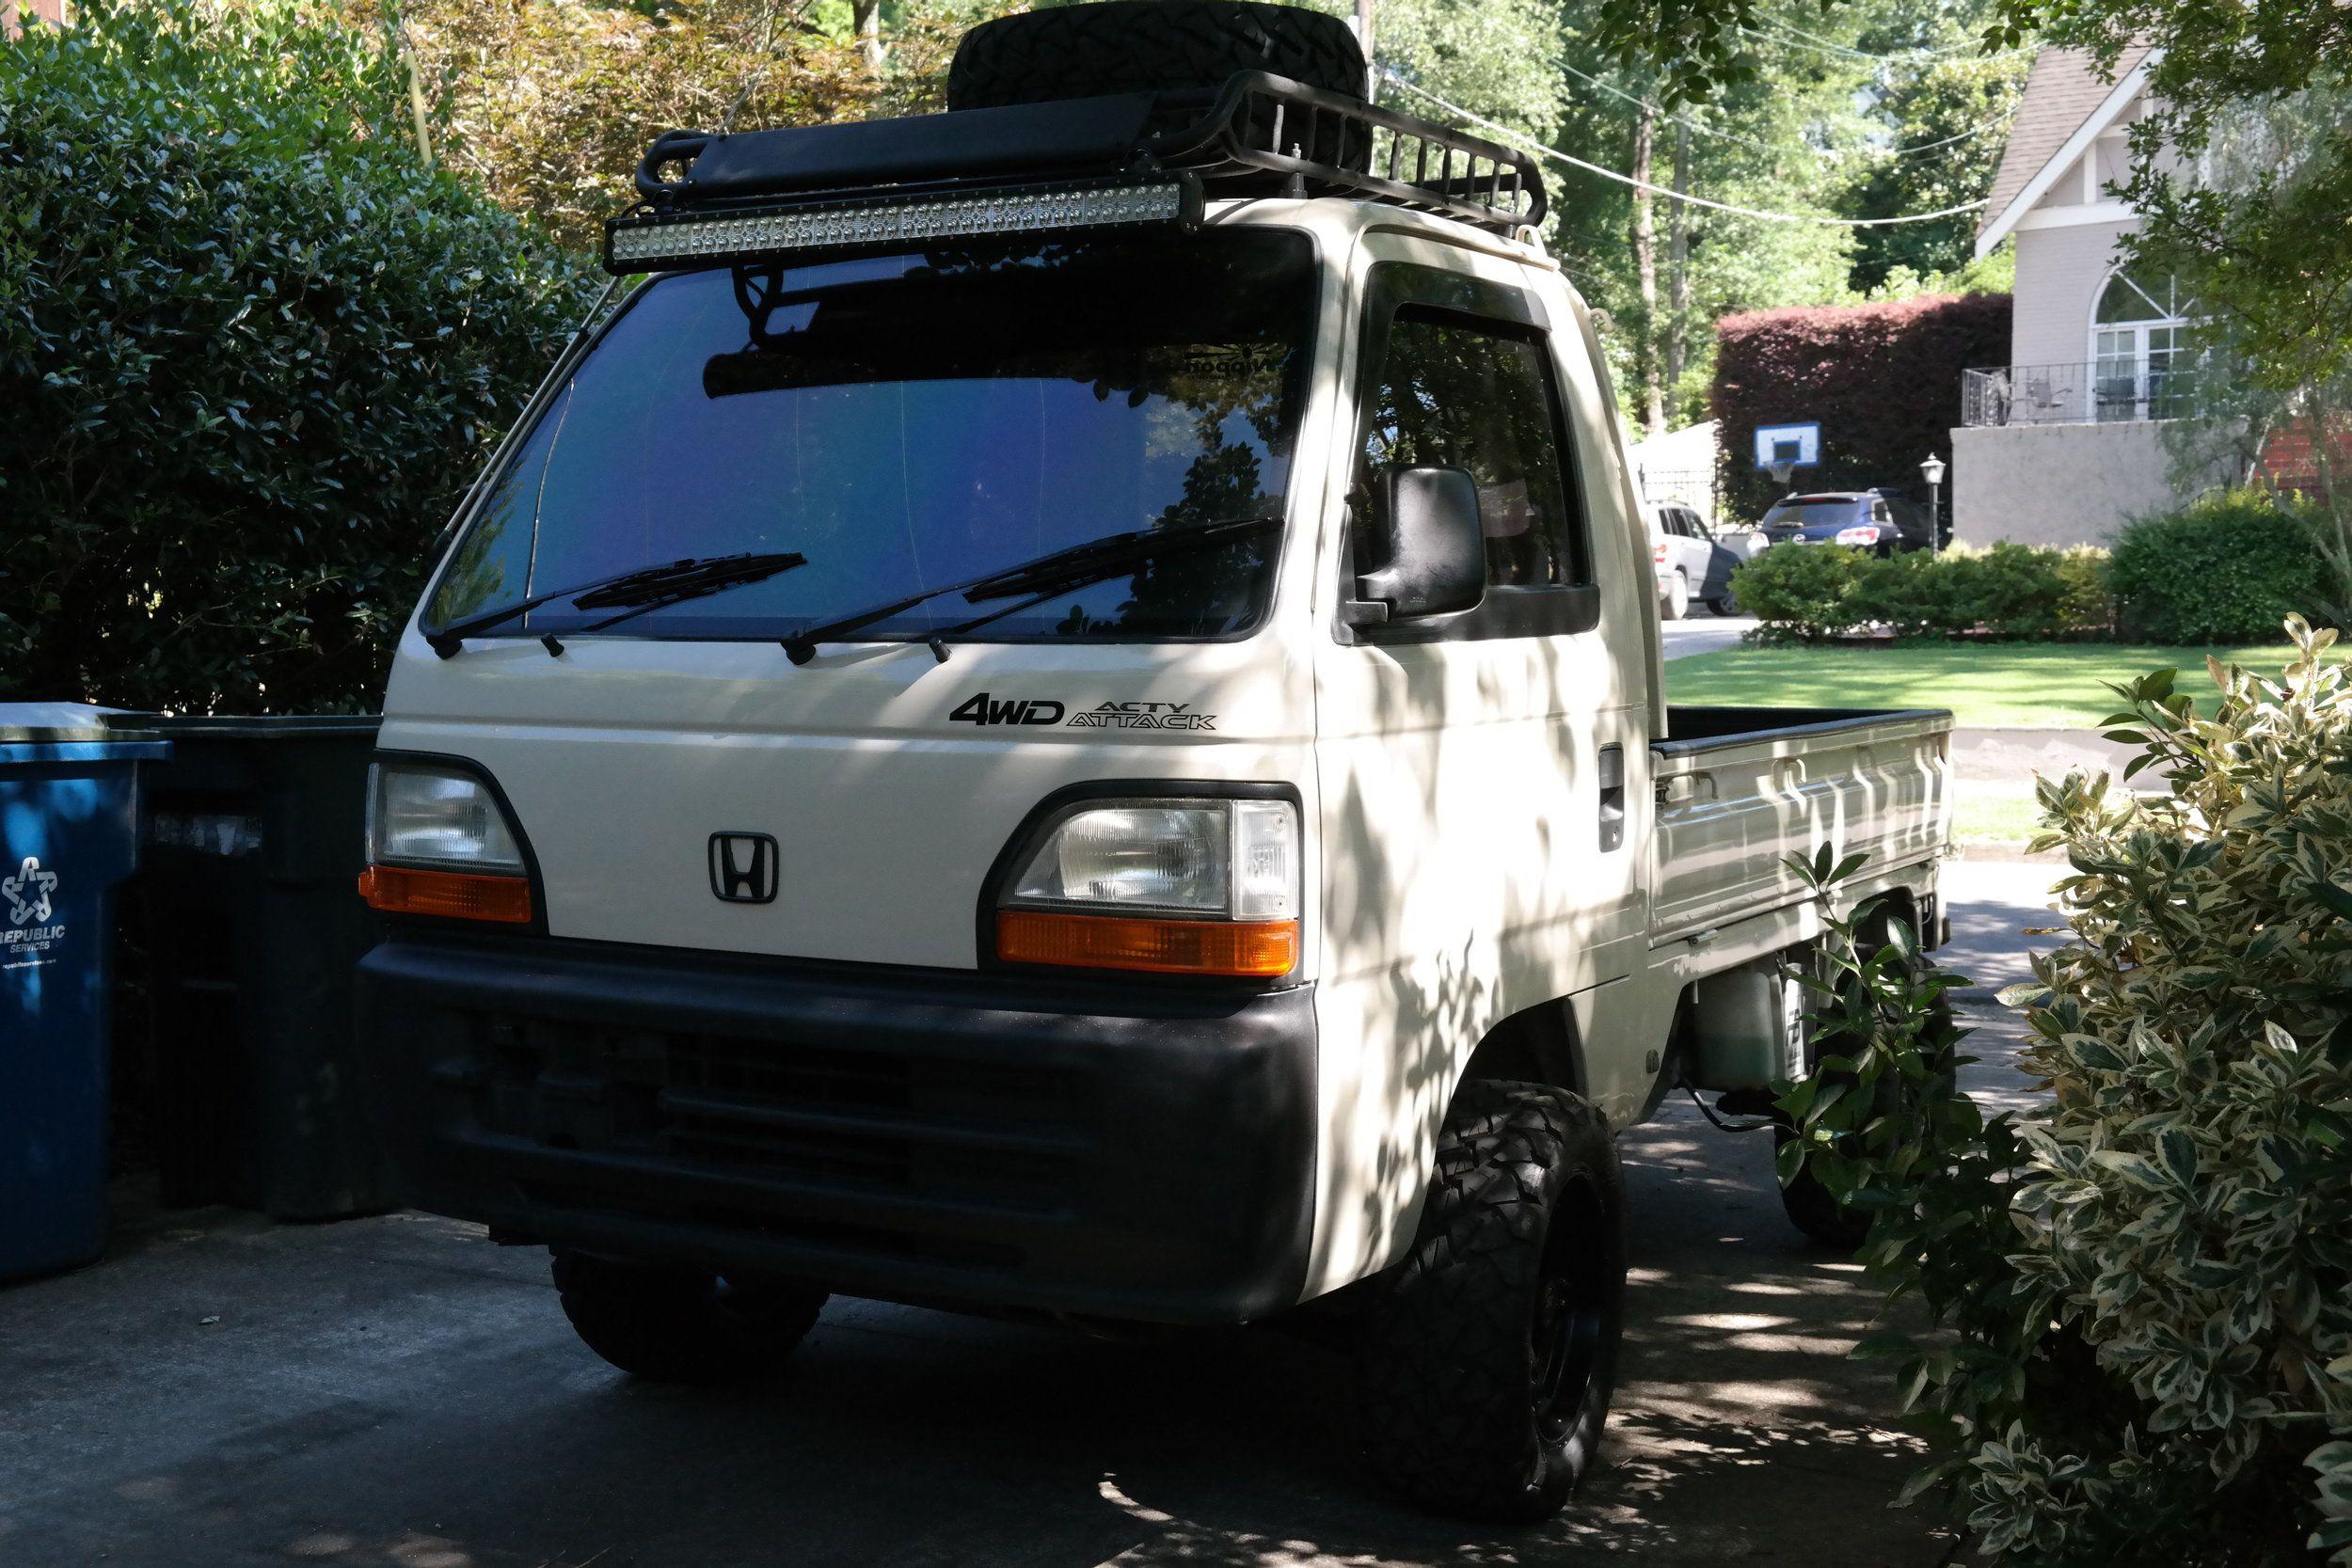 1994 Honda Acty Truck In 2020 Trucks Mini Trucks Honda